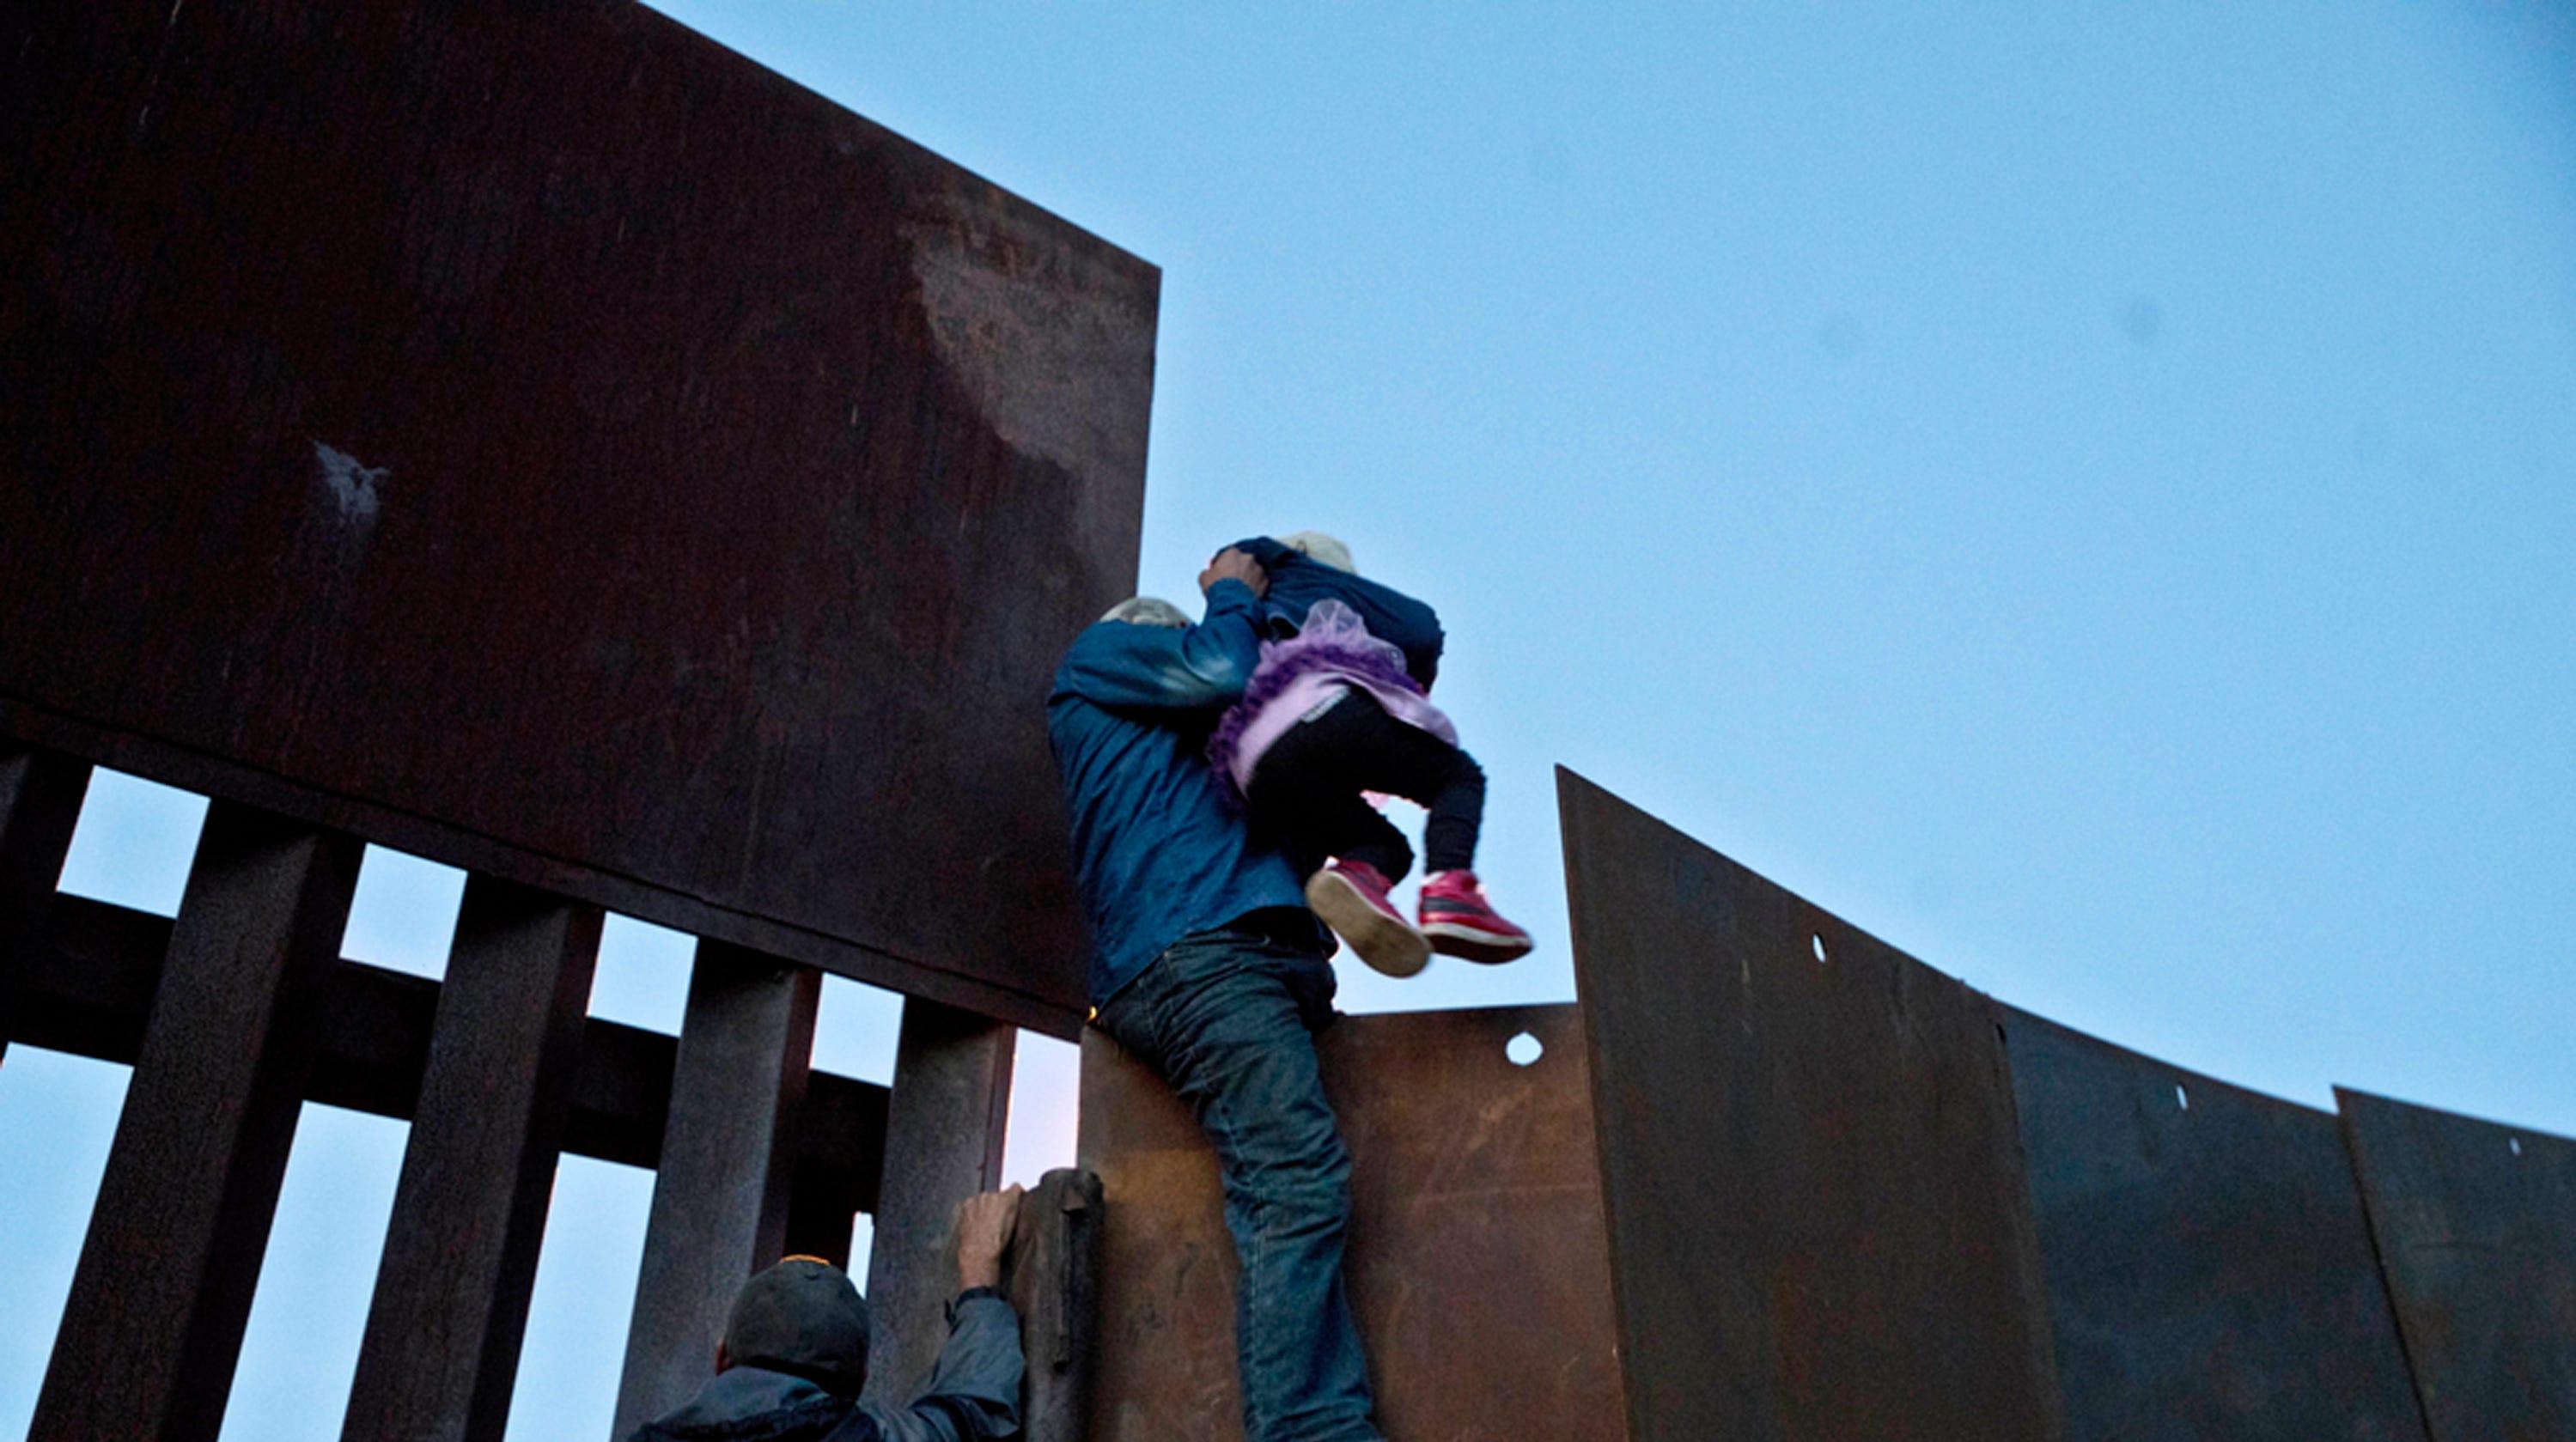 President Trump claims border wall 'ahead of schedule' despite slow progress